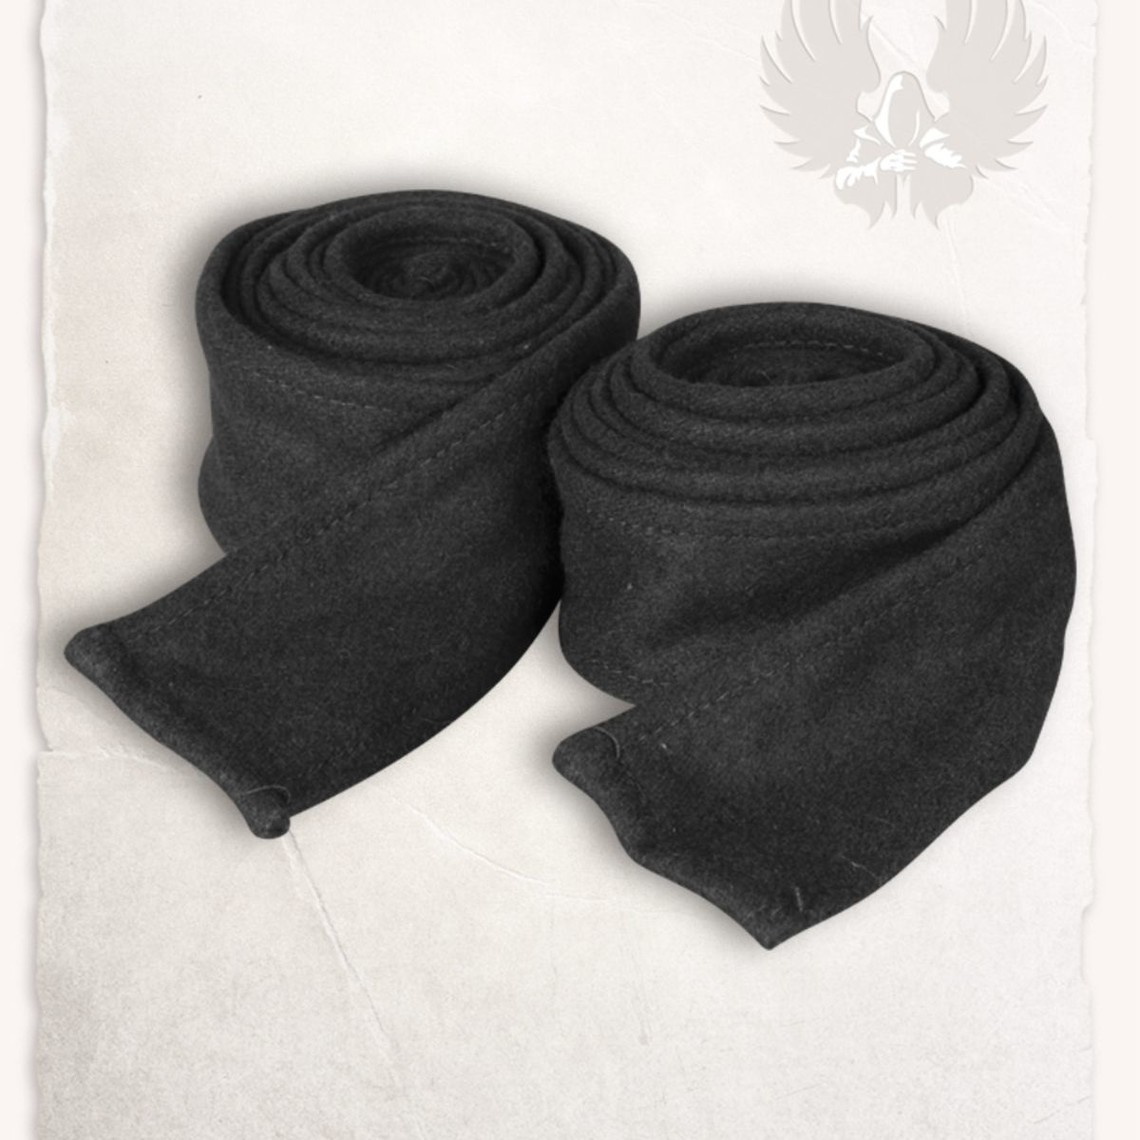 Mytholon Arm Umhüllungen Hamond Wolle schwarz